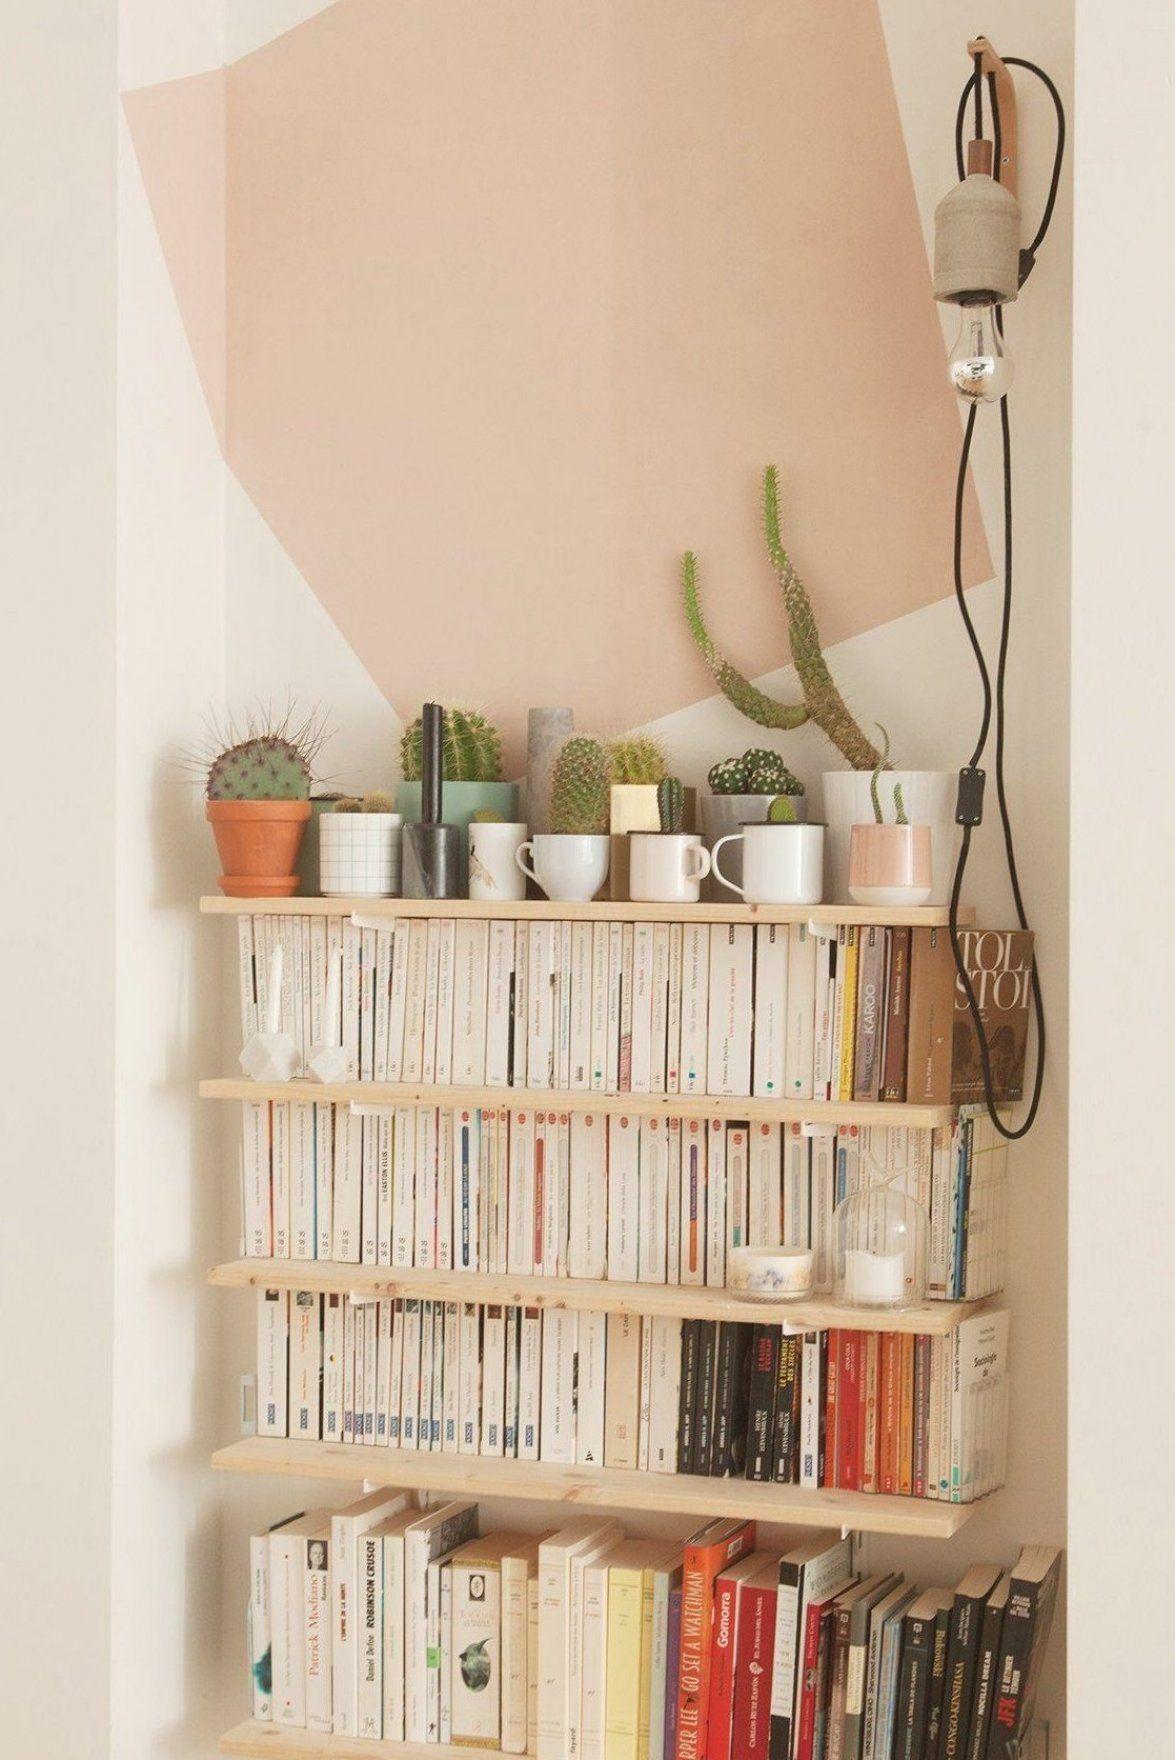 The Socialite Family   Biblioth  que aux tons pastels chez Laura Fernandez Ruiz  #famille #family #bruxelles #laurafernandezruiz #untilone #architecture #architecte #homestyle #decorinspiration #bookshelf #biblioth  que #pink #rose #cactus #doityourself #wood #bois #idea #decoration #decor #home #thesocialitefamily